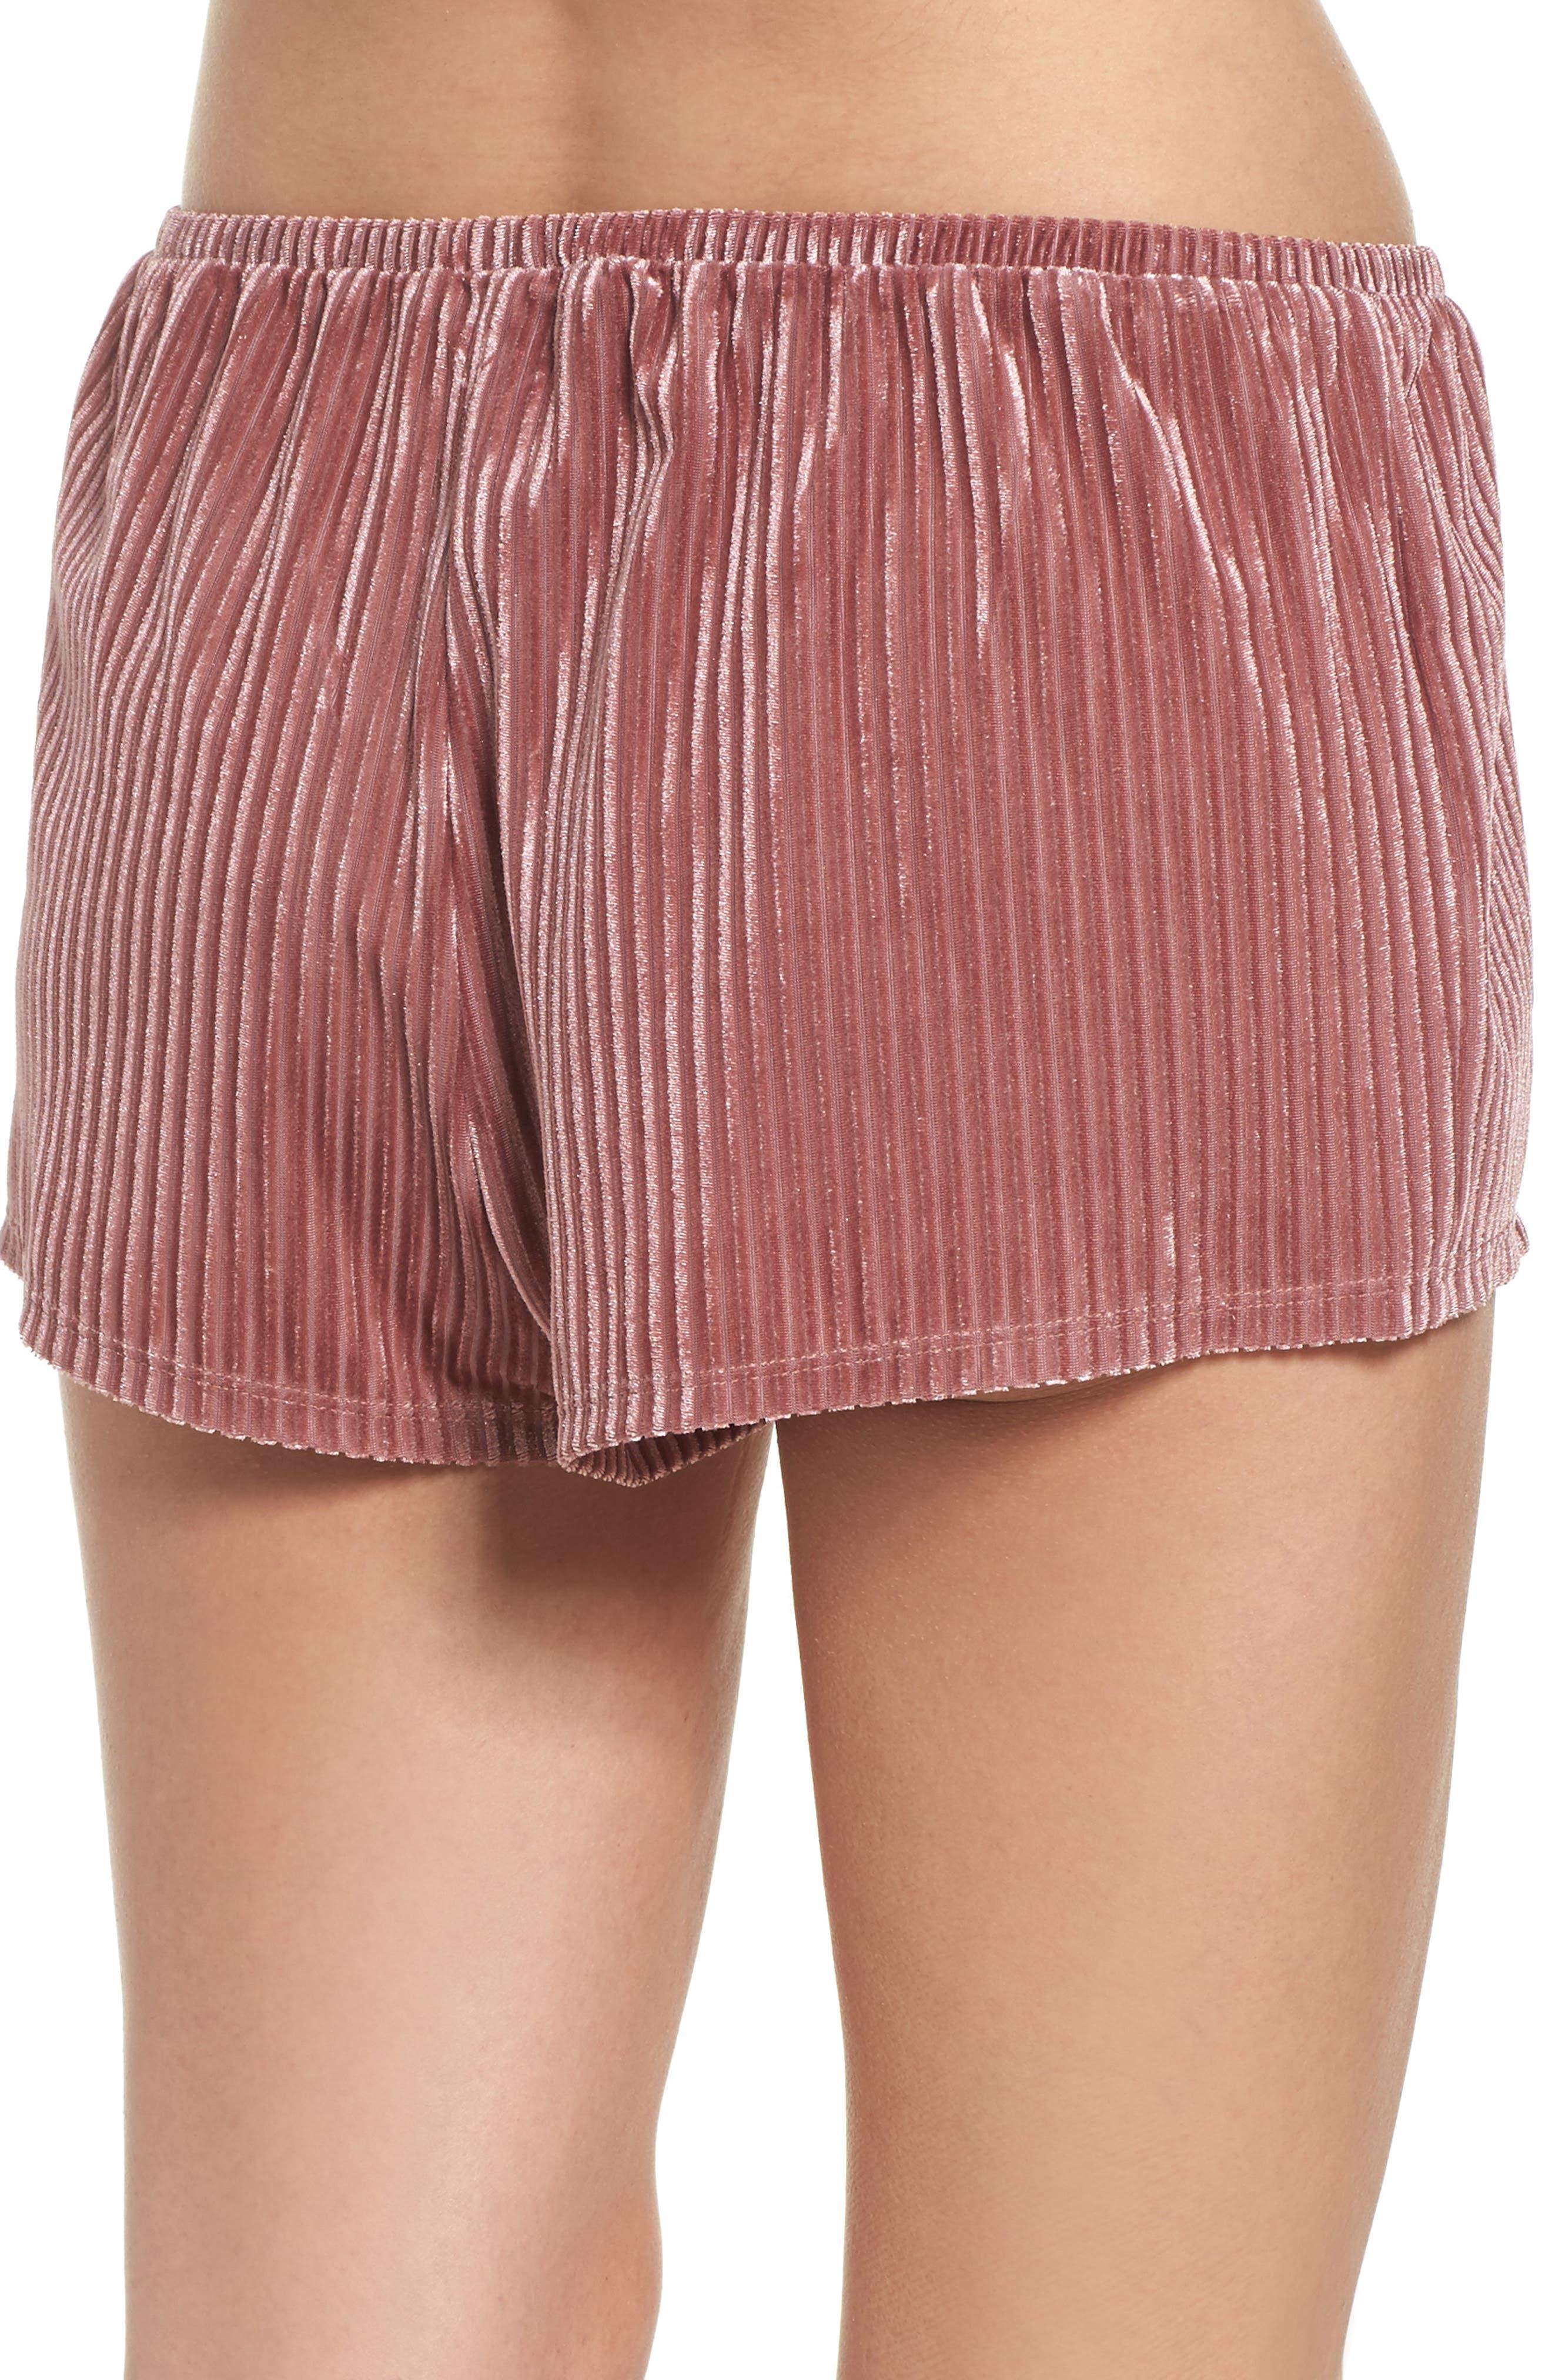 Velvet Pajama Shorts,                             Alternate thumbnail 2, color,                             Rose